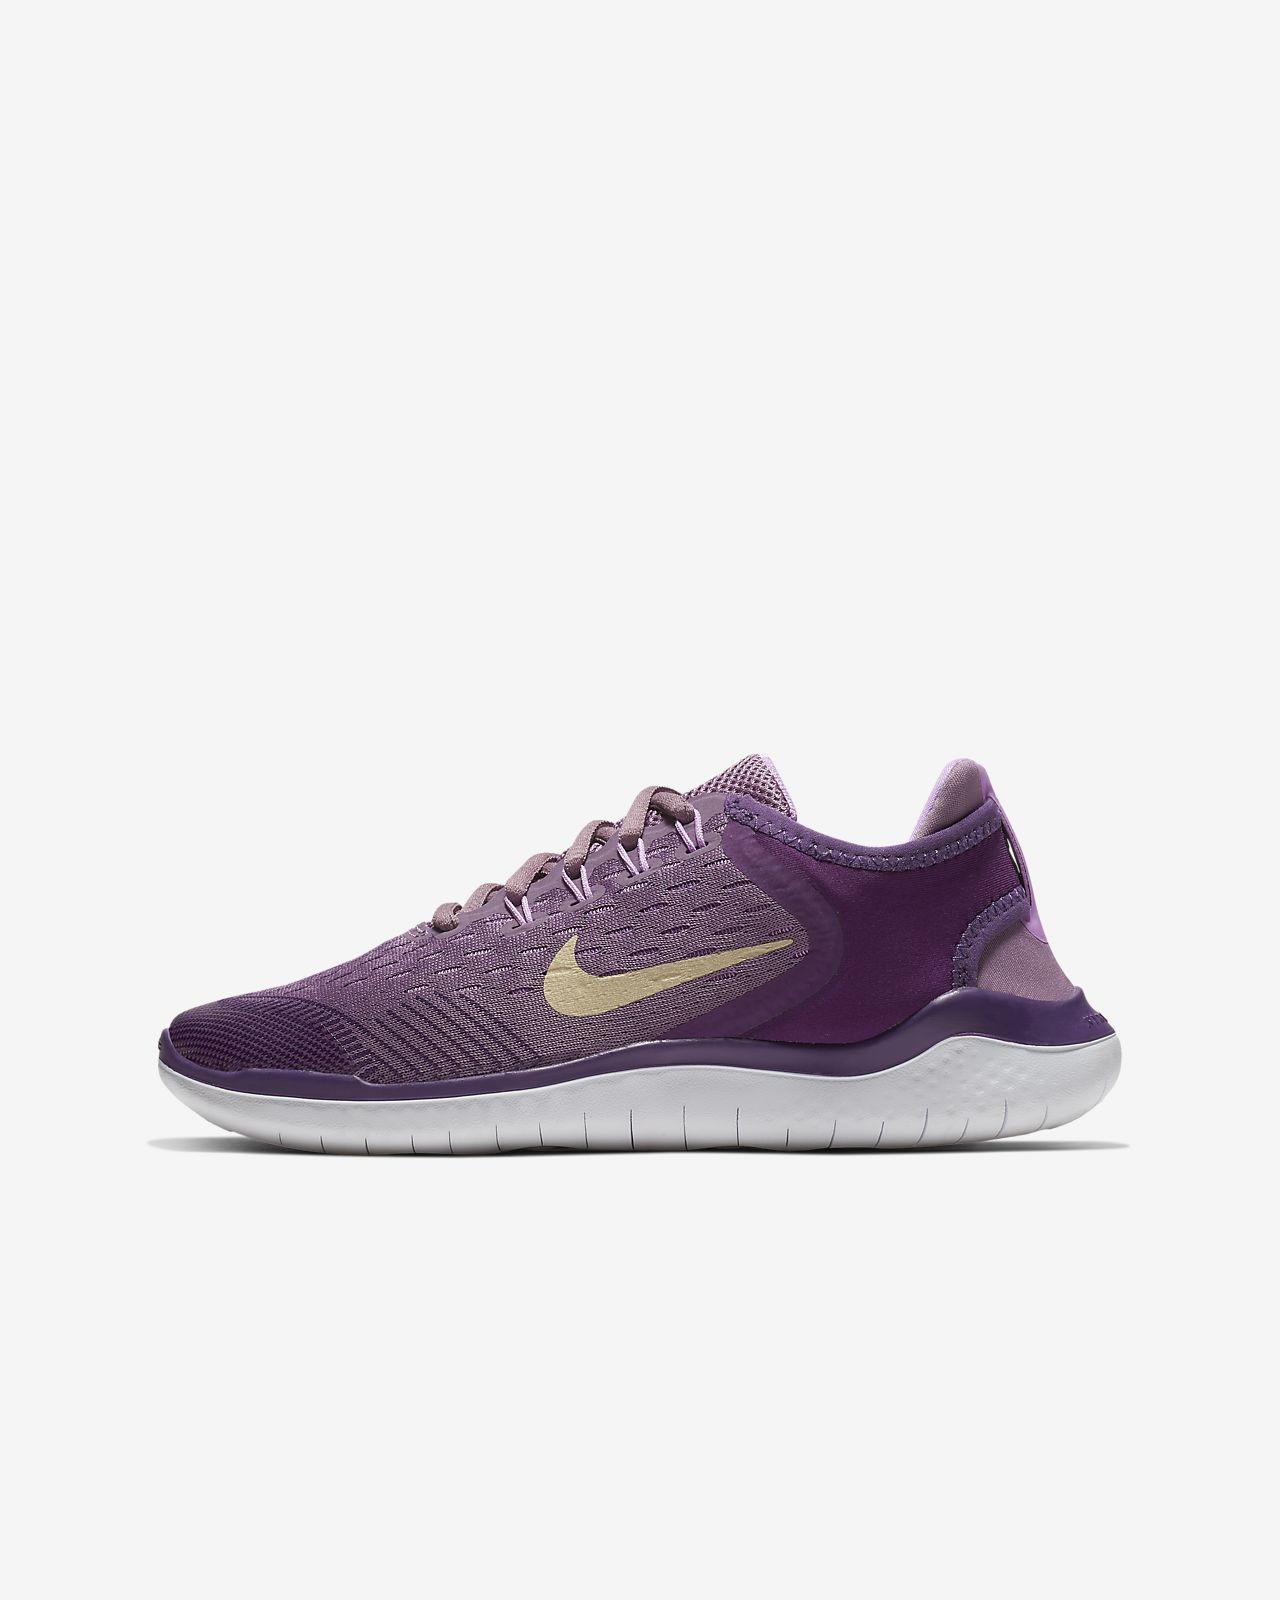 Calzado de running para niños talla grande Nike Free RN 2018